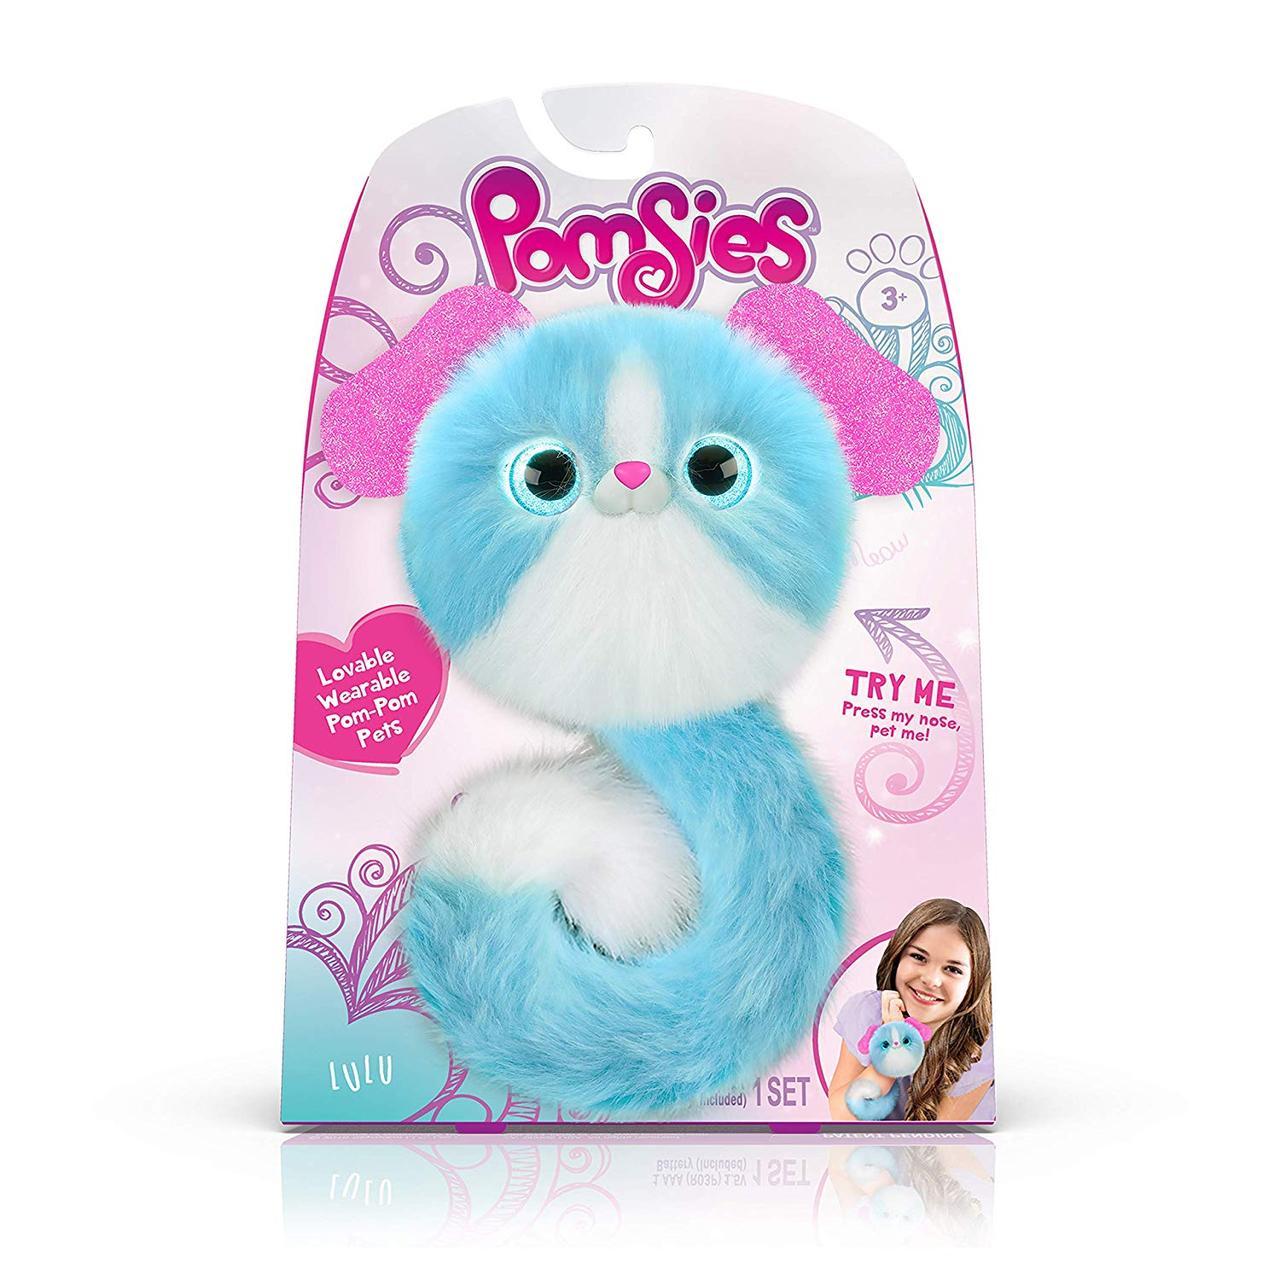 Помсис Лулу интерактивная игрушка памзис памсис щенок Pomsies Lulu Puppy Toy мятного цвета